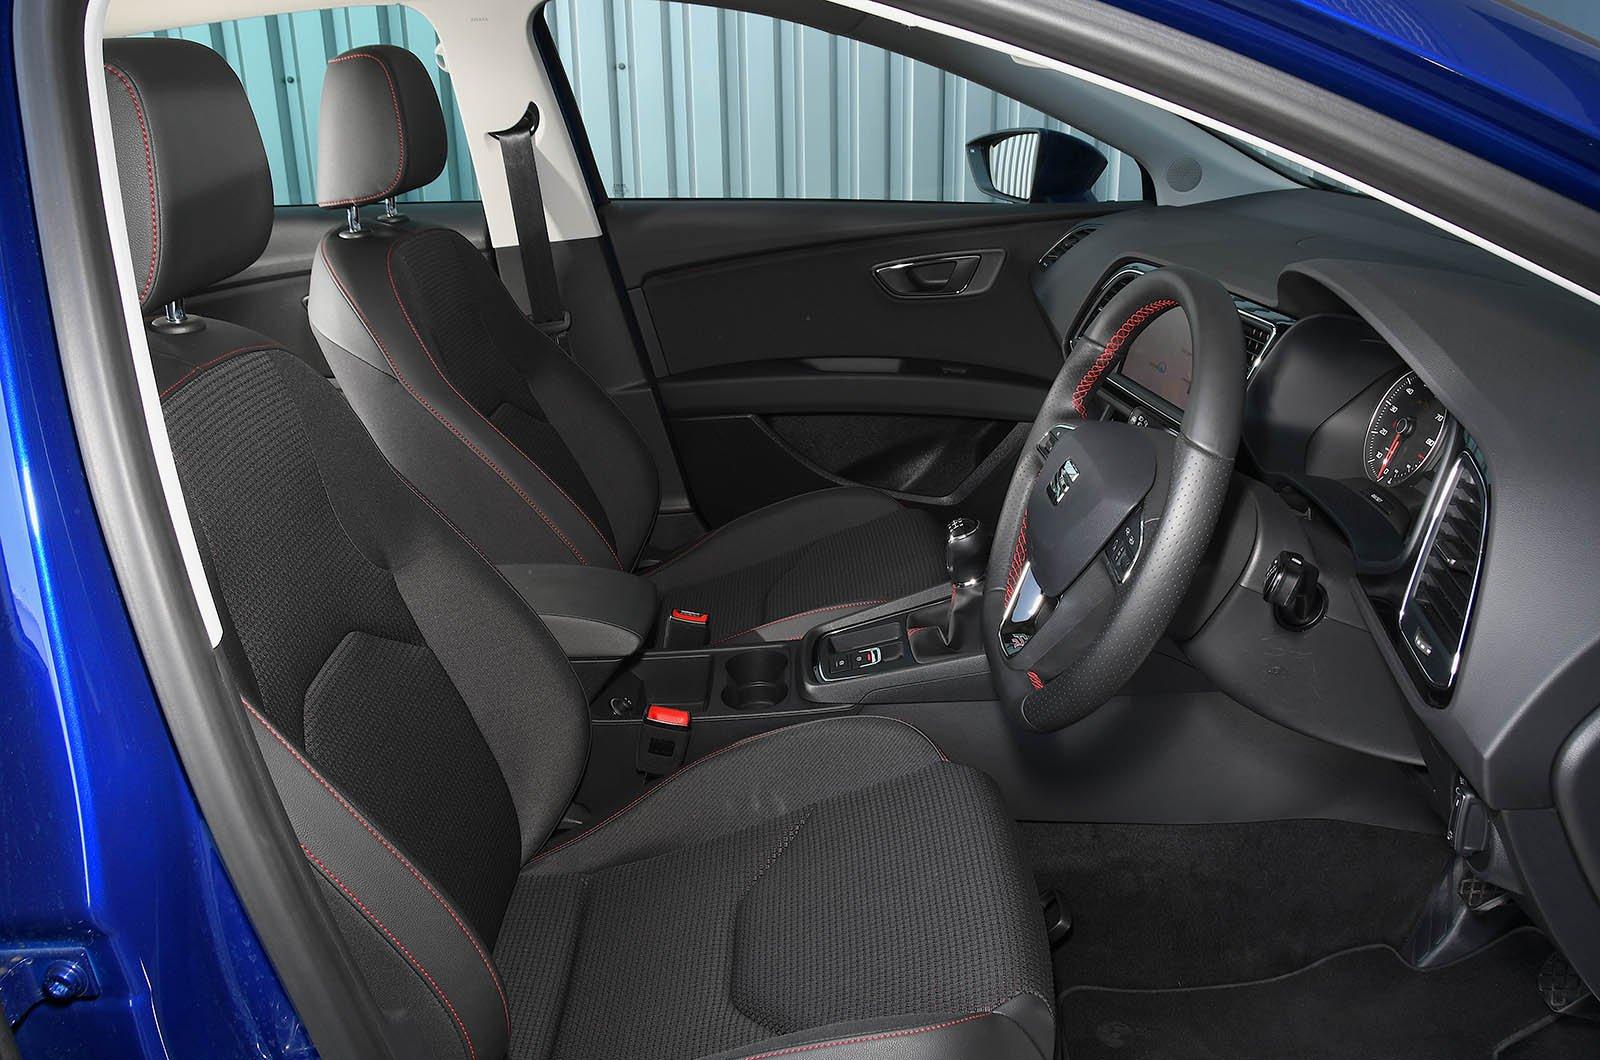 Seat Leon (2013 - present) driving position